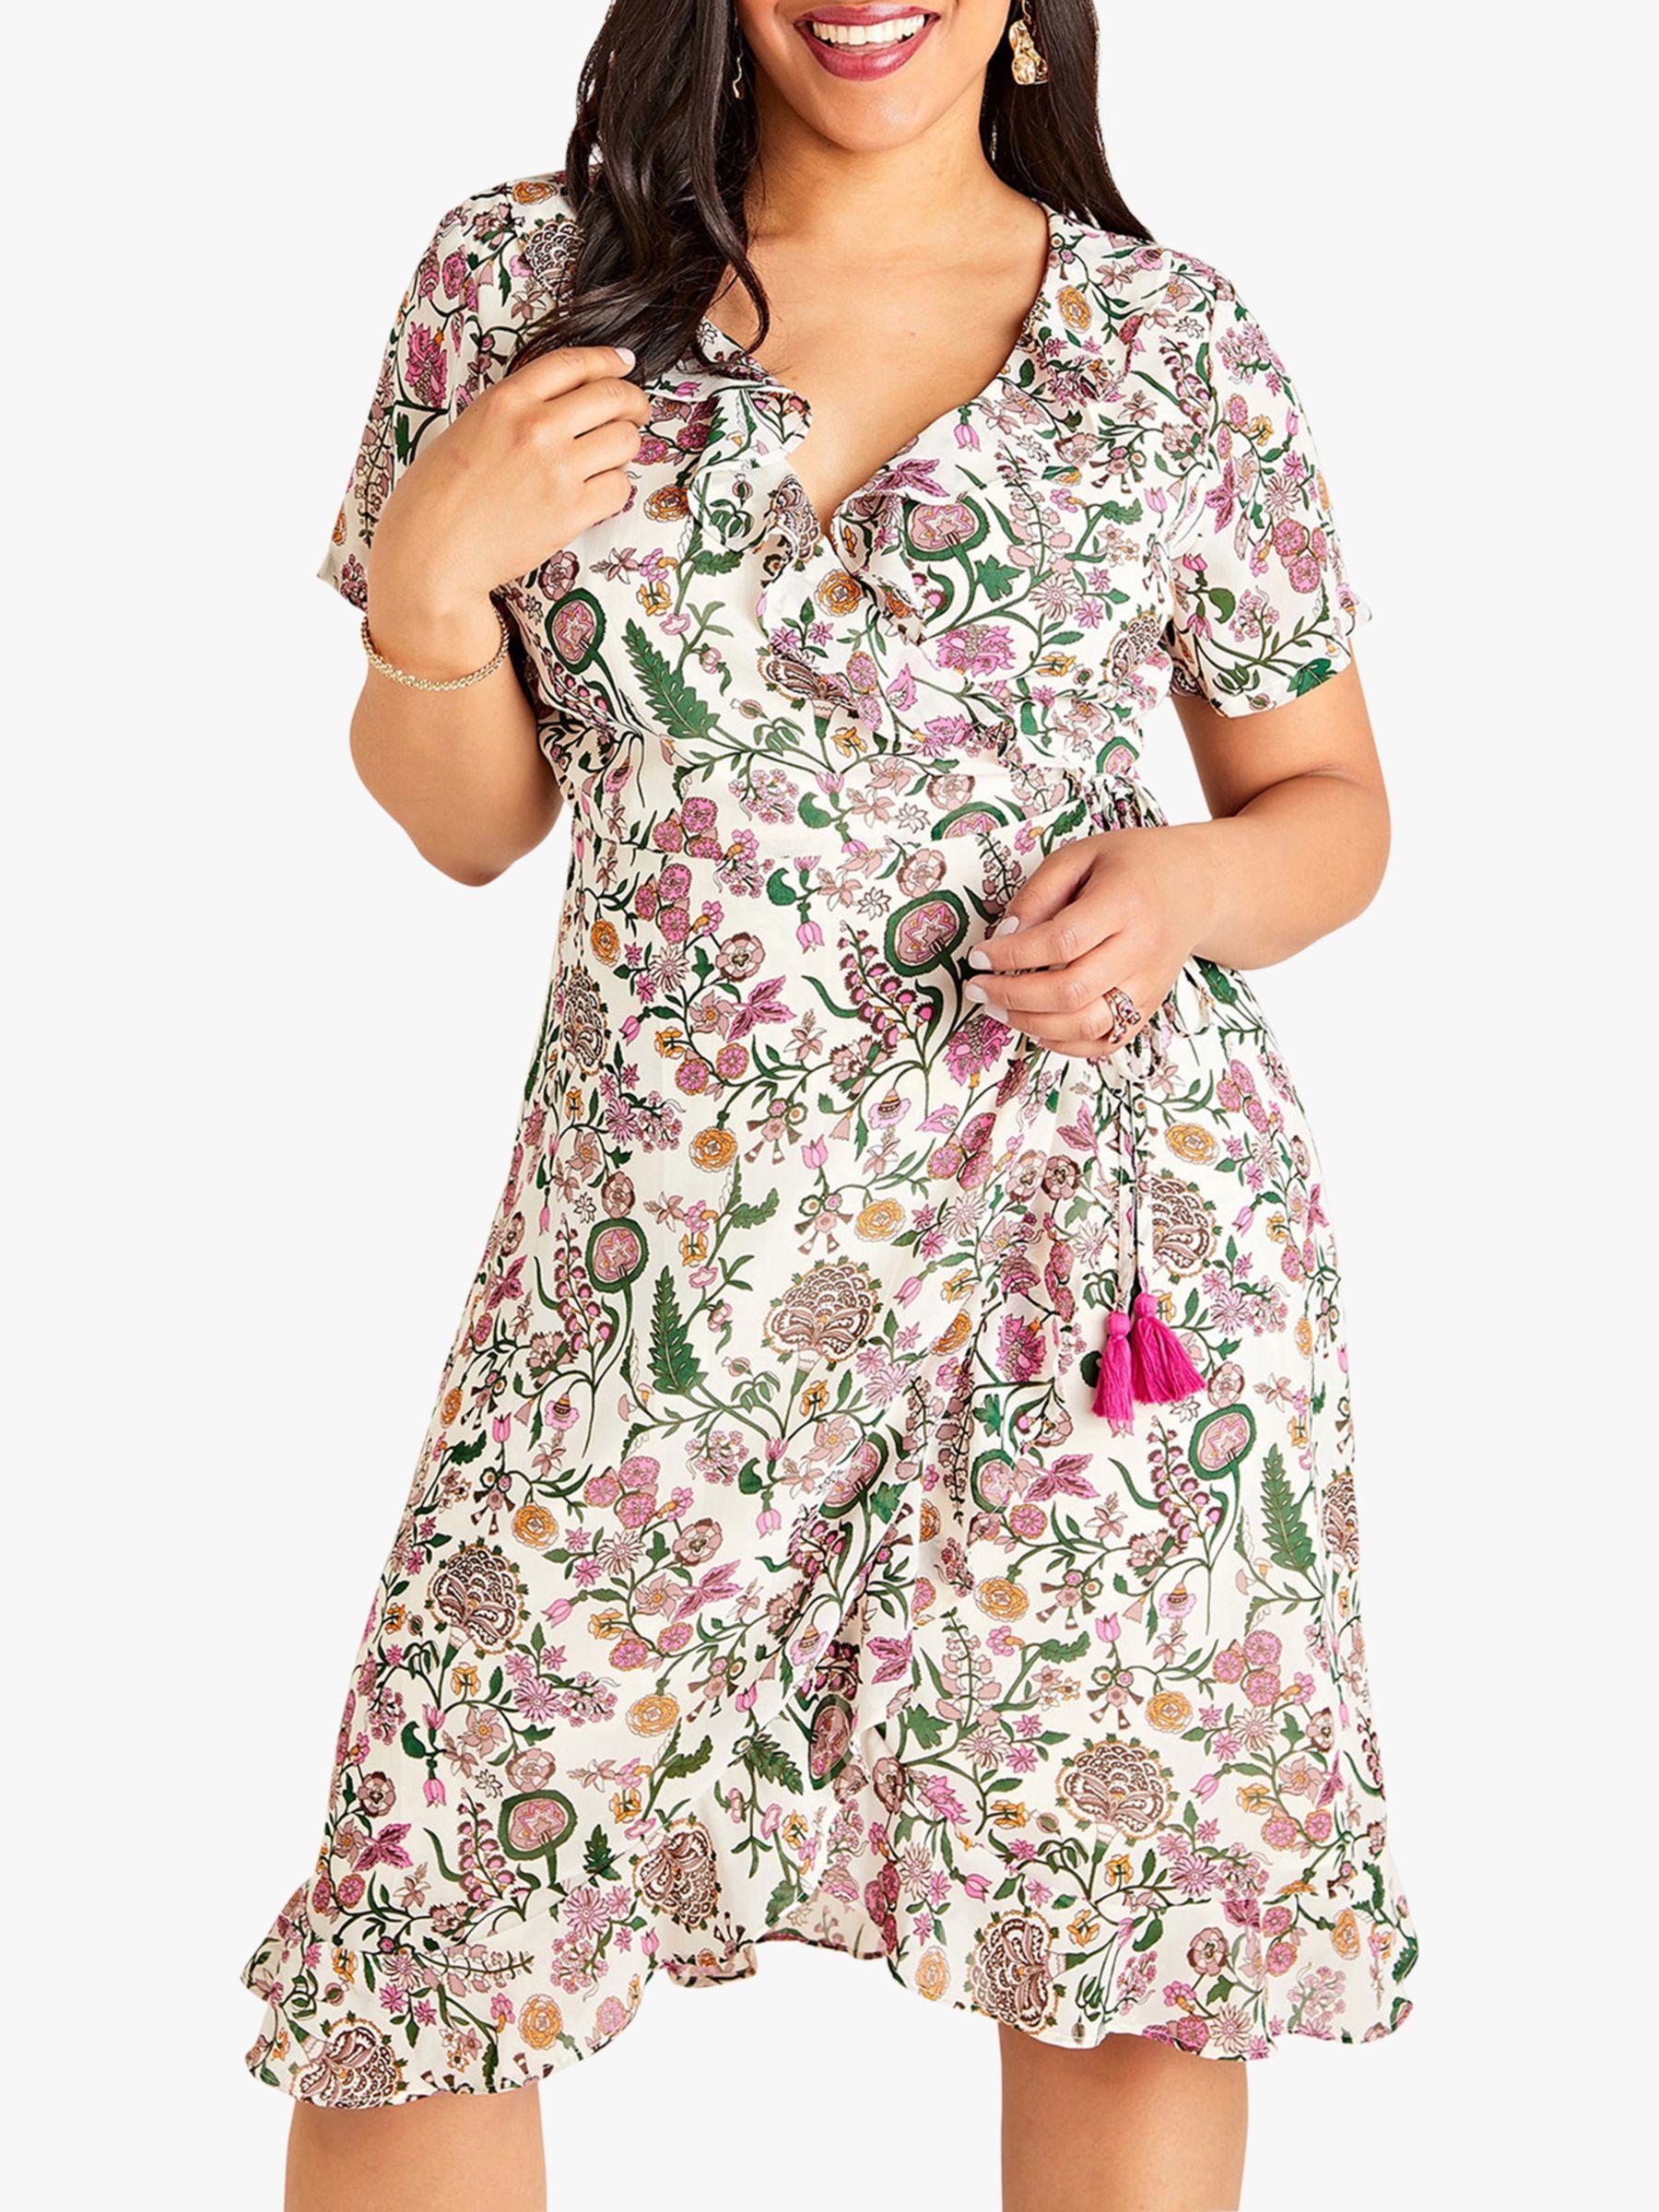 Yumi Curves Yumi Curves Wrap Garden Print Dress, Ivory